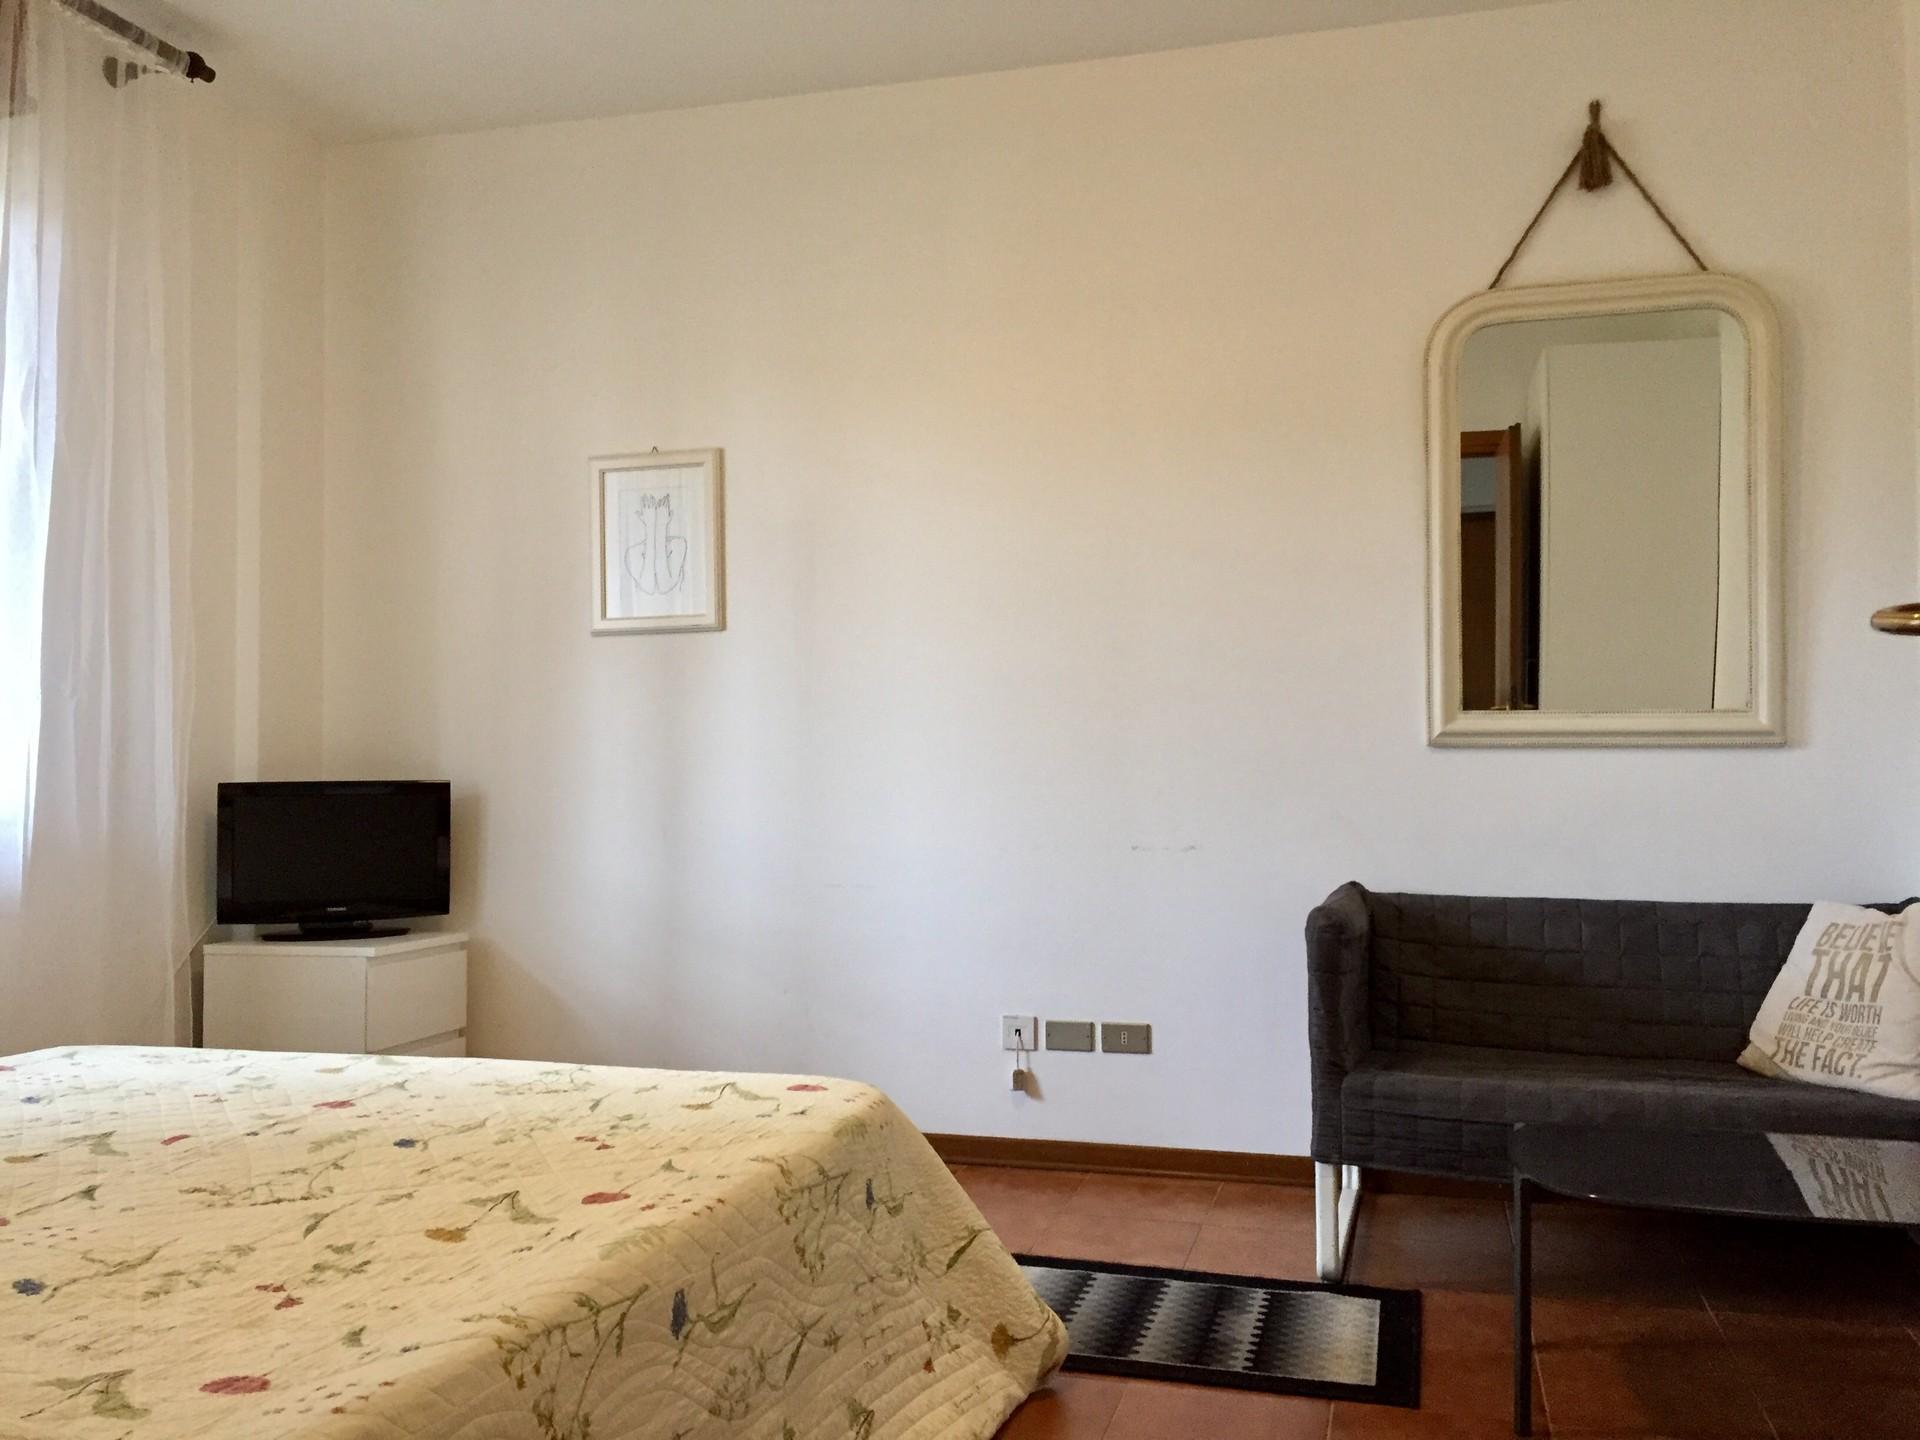 Letto Matrimoniale A Udine.Se Alquila Piso De 3 Habitaciones En Udine Se Admiten Mascotas Y